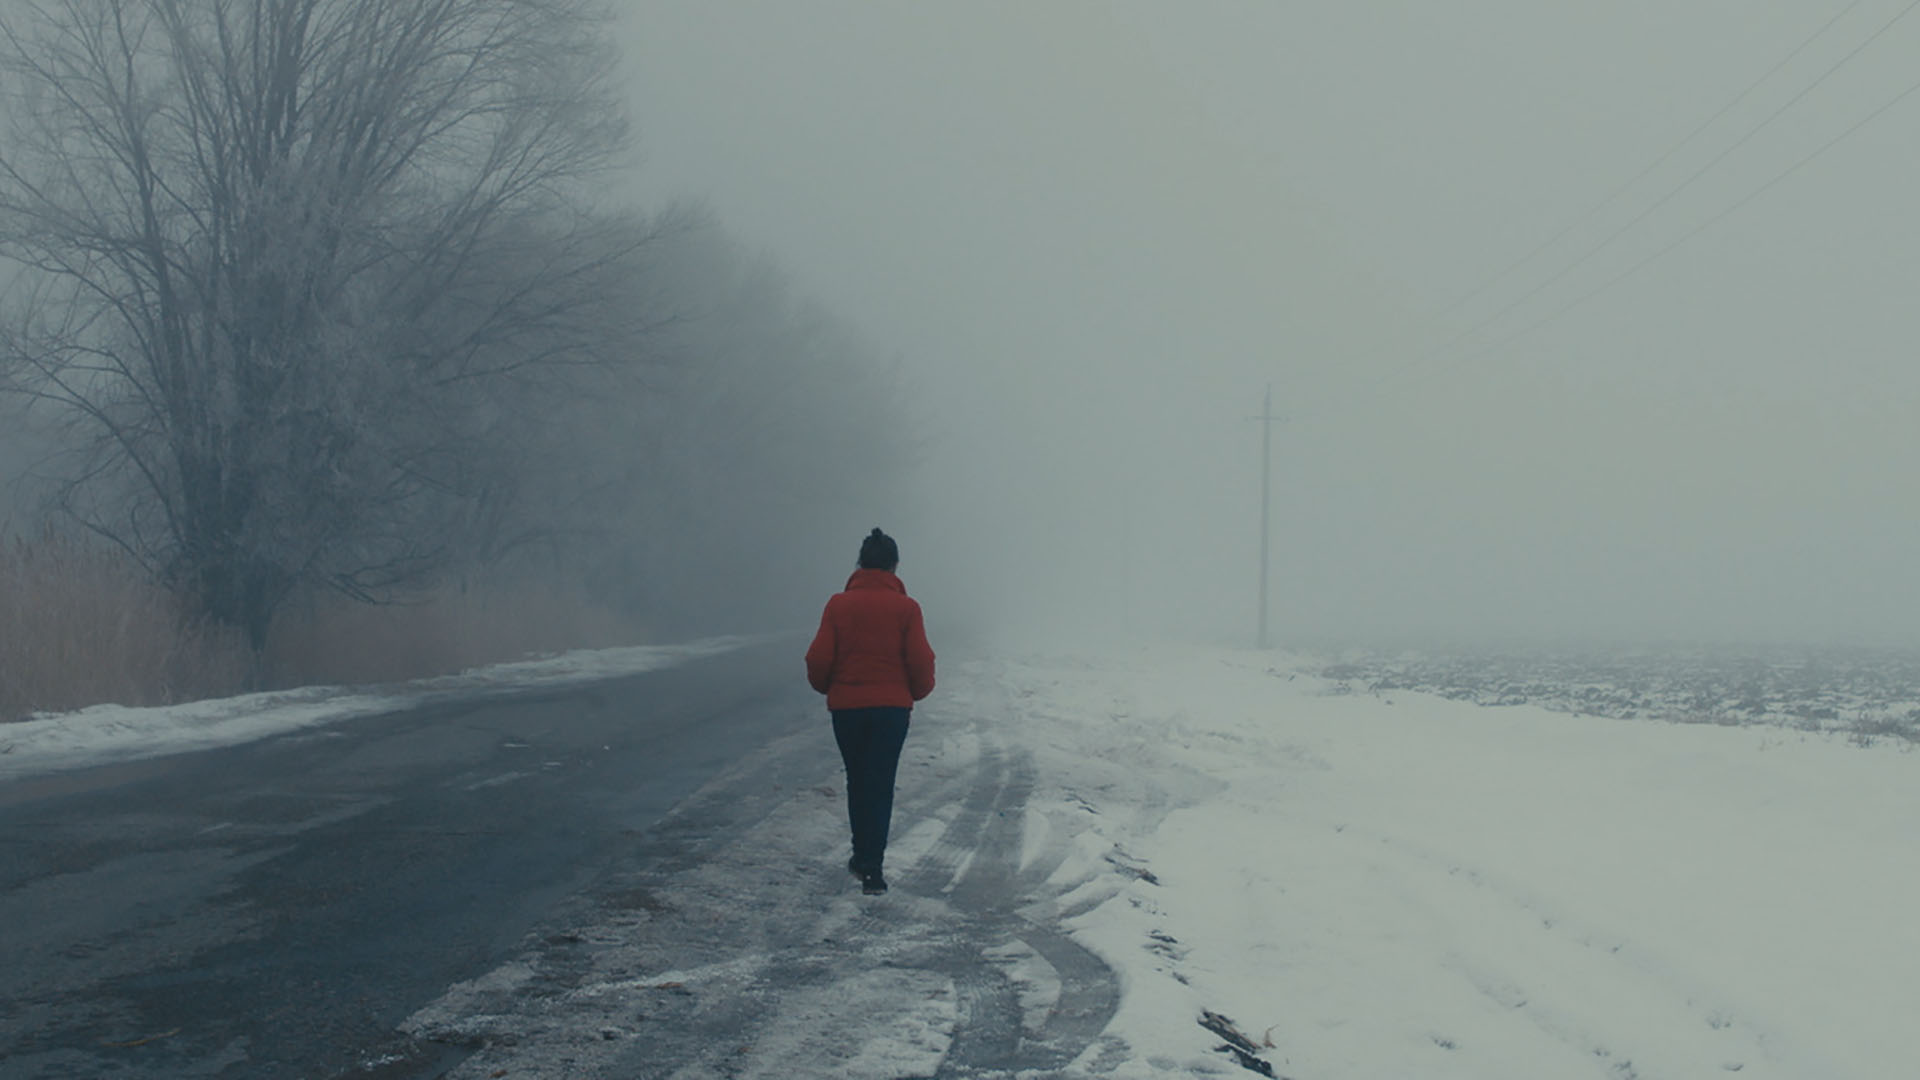 Ulbolsõn – üksi kõigi vastu